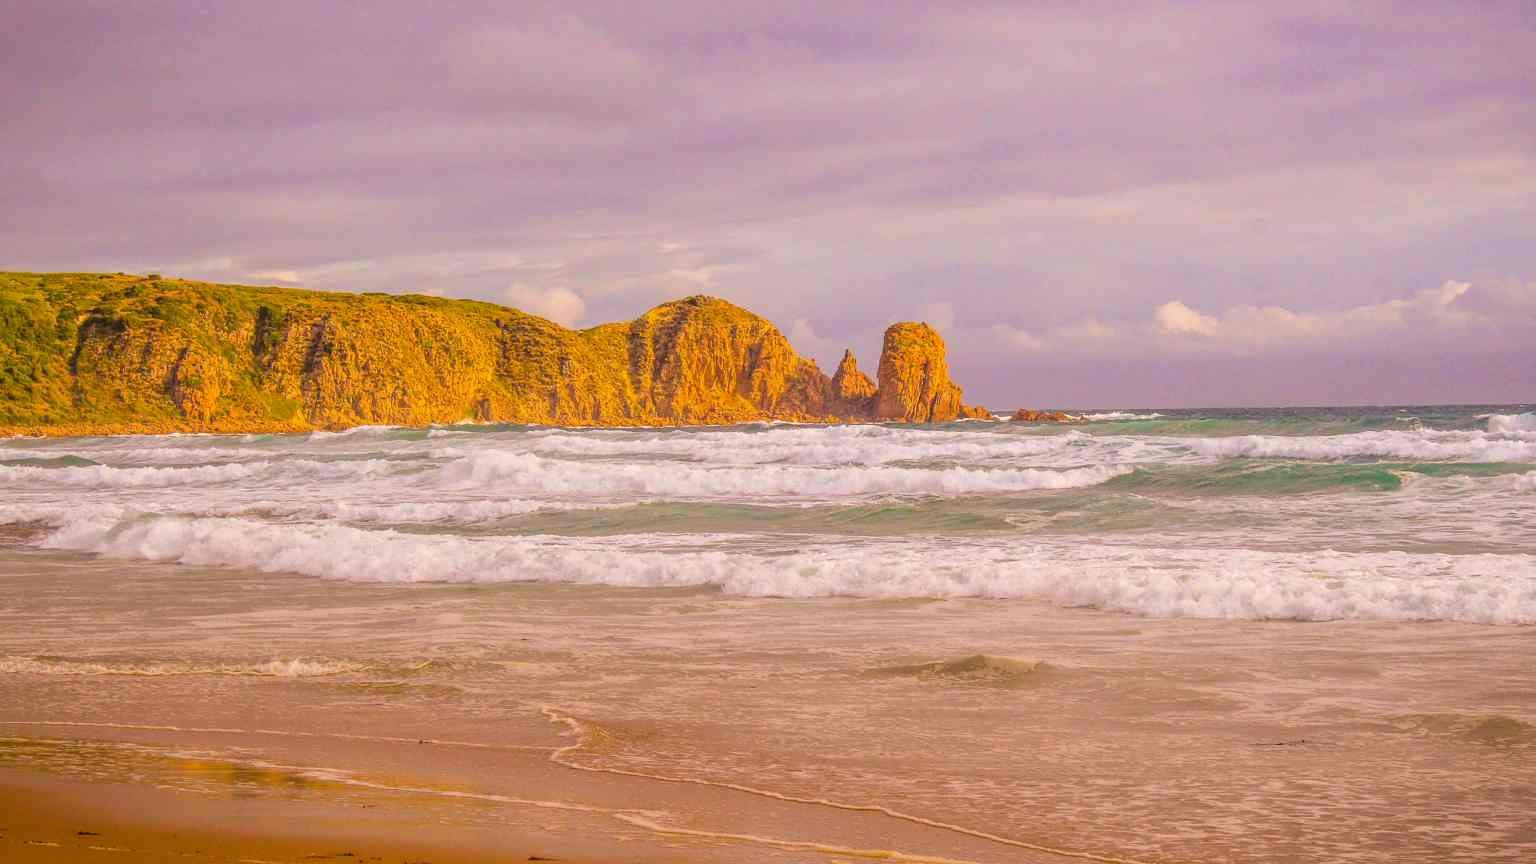 Photo taken in Phillip Island, Australia